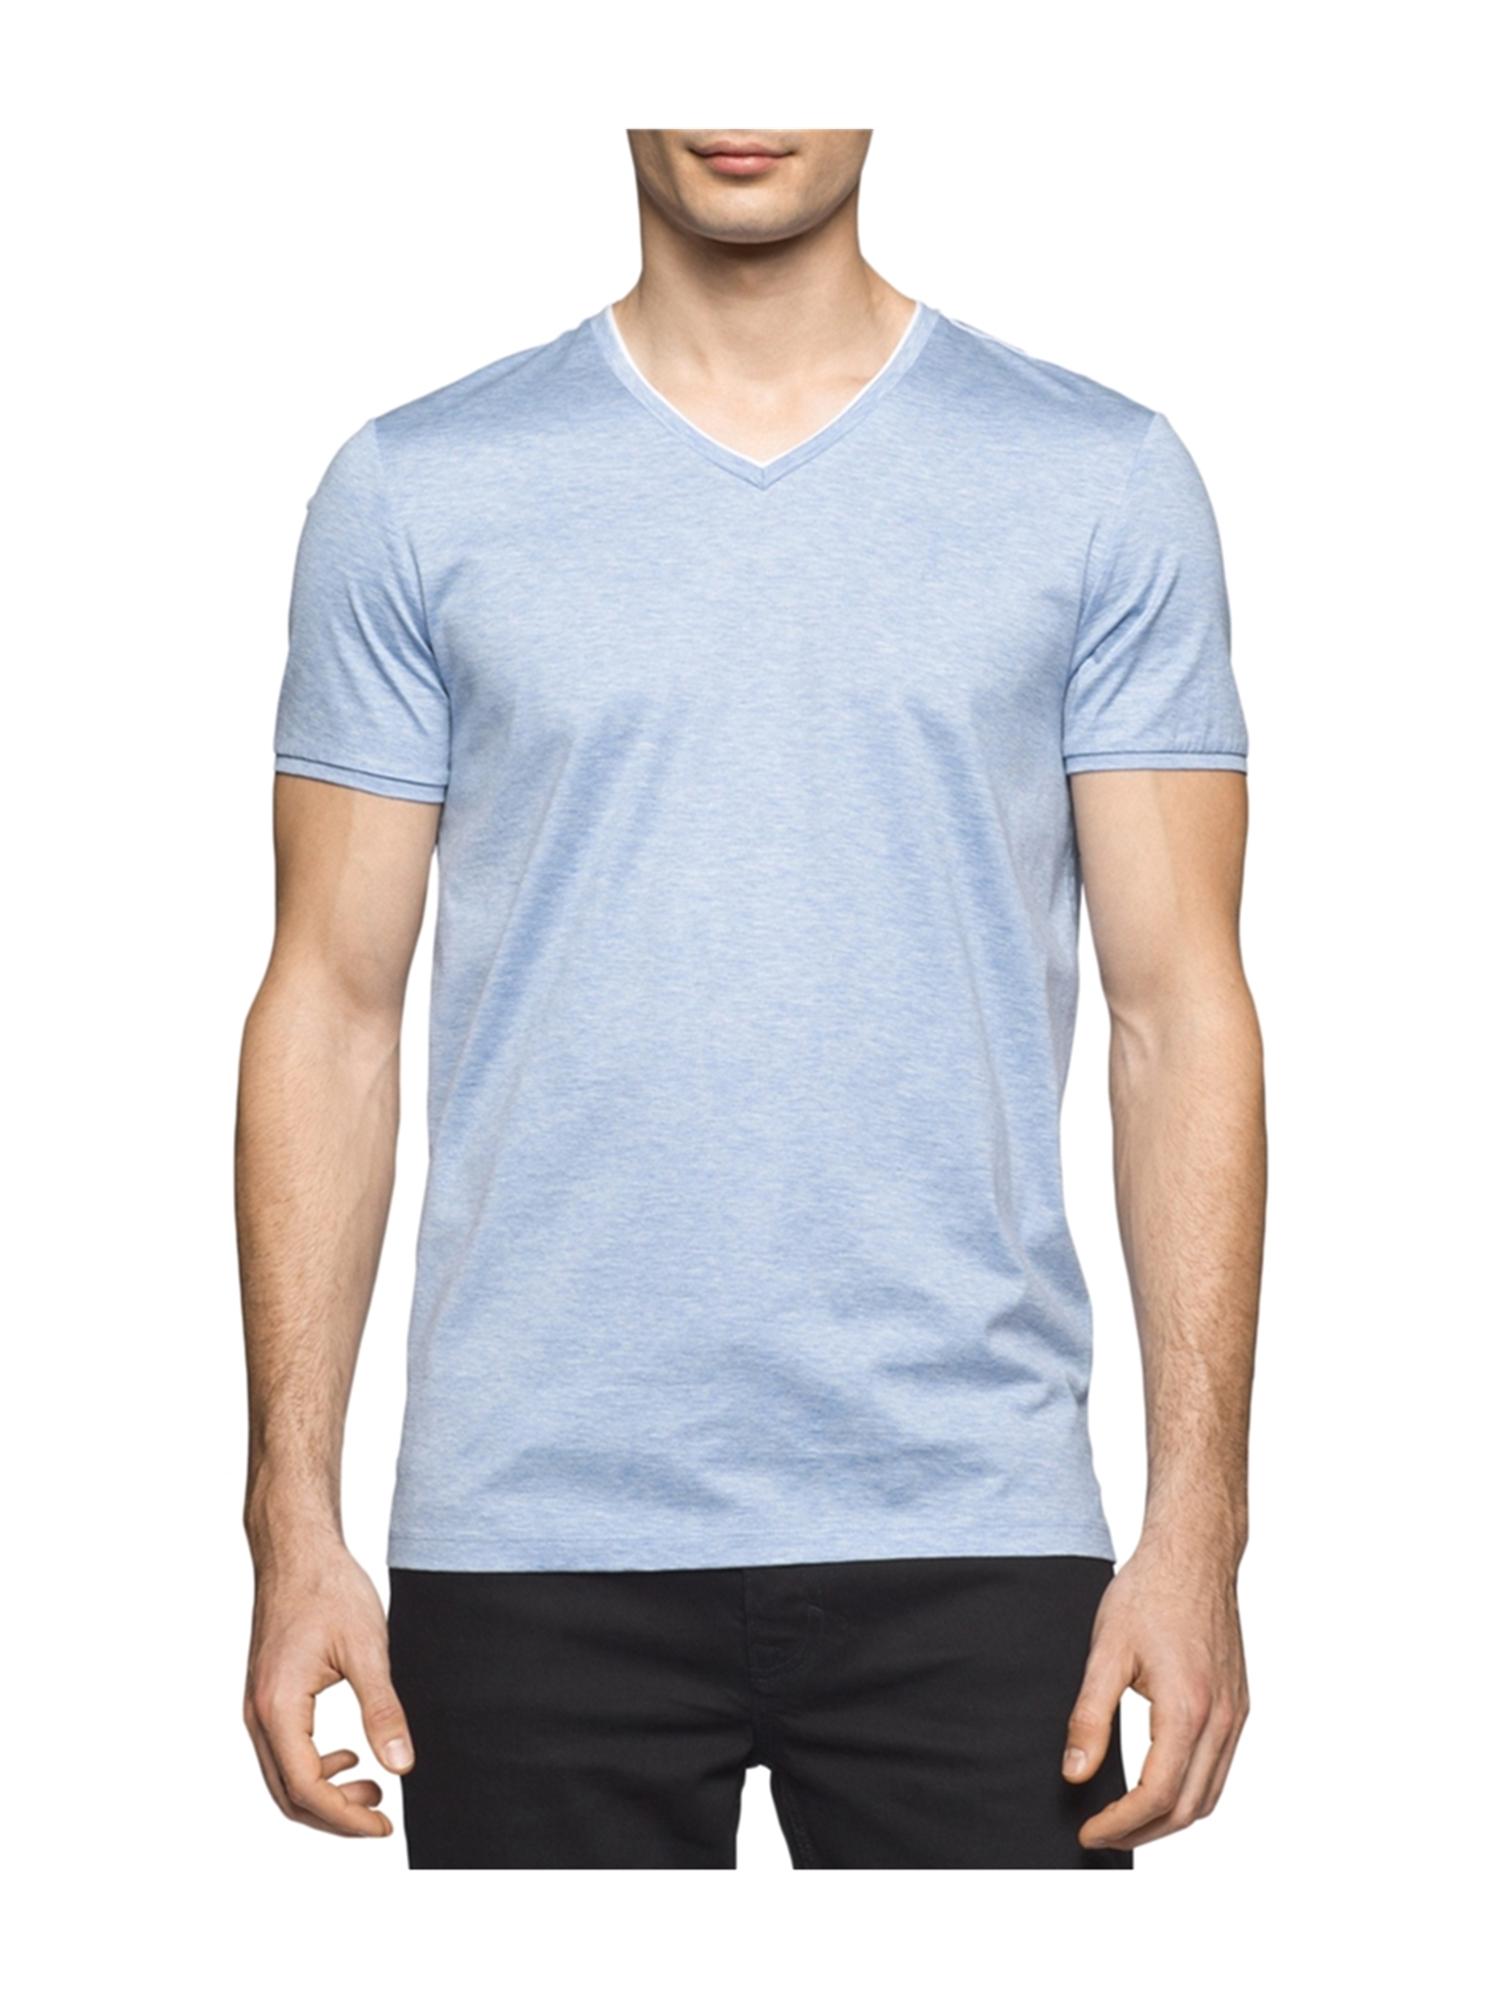 df8a5ac43116d Calvin Klein Mens Cotton Basic T-Shirt icedpurple M